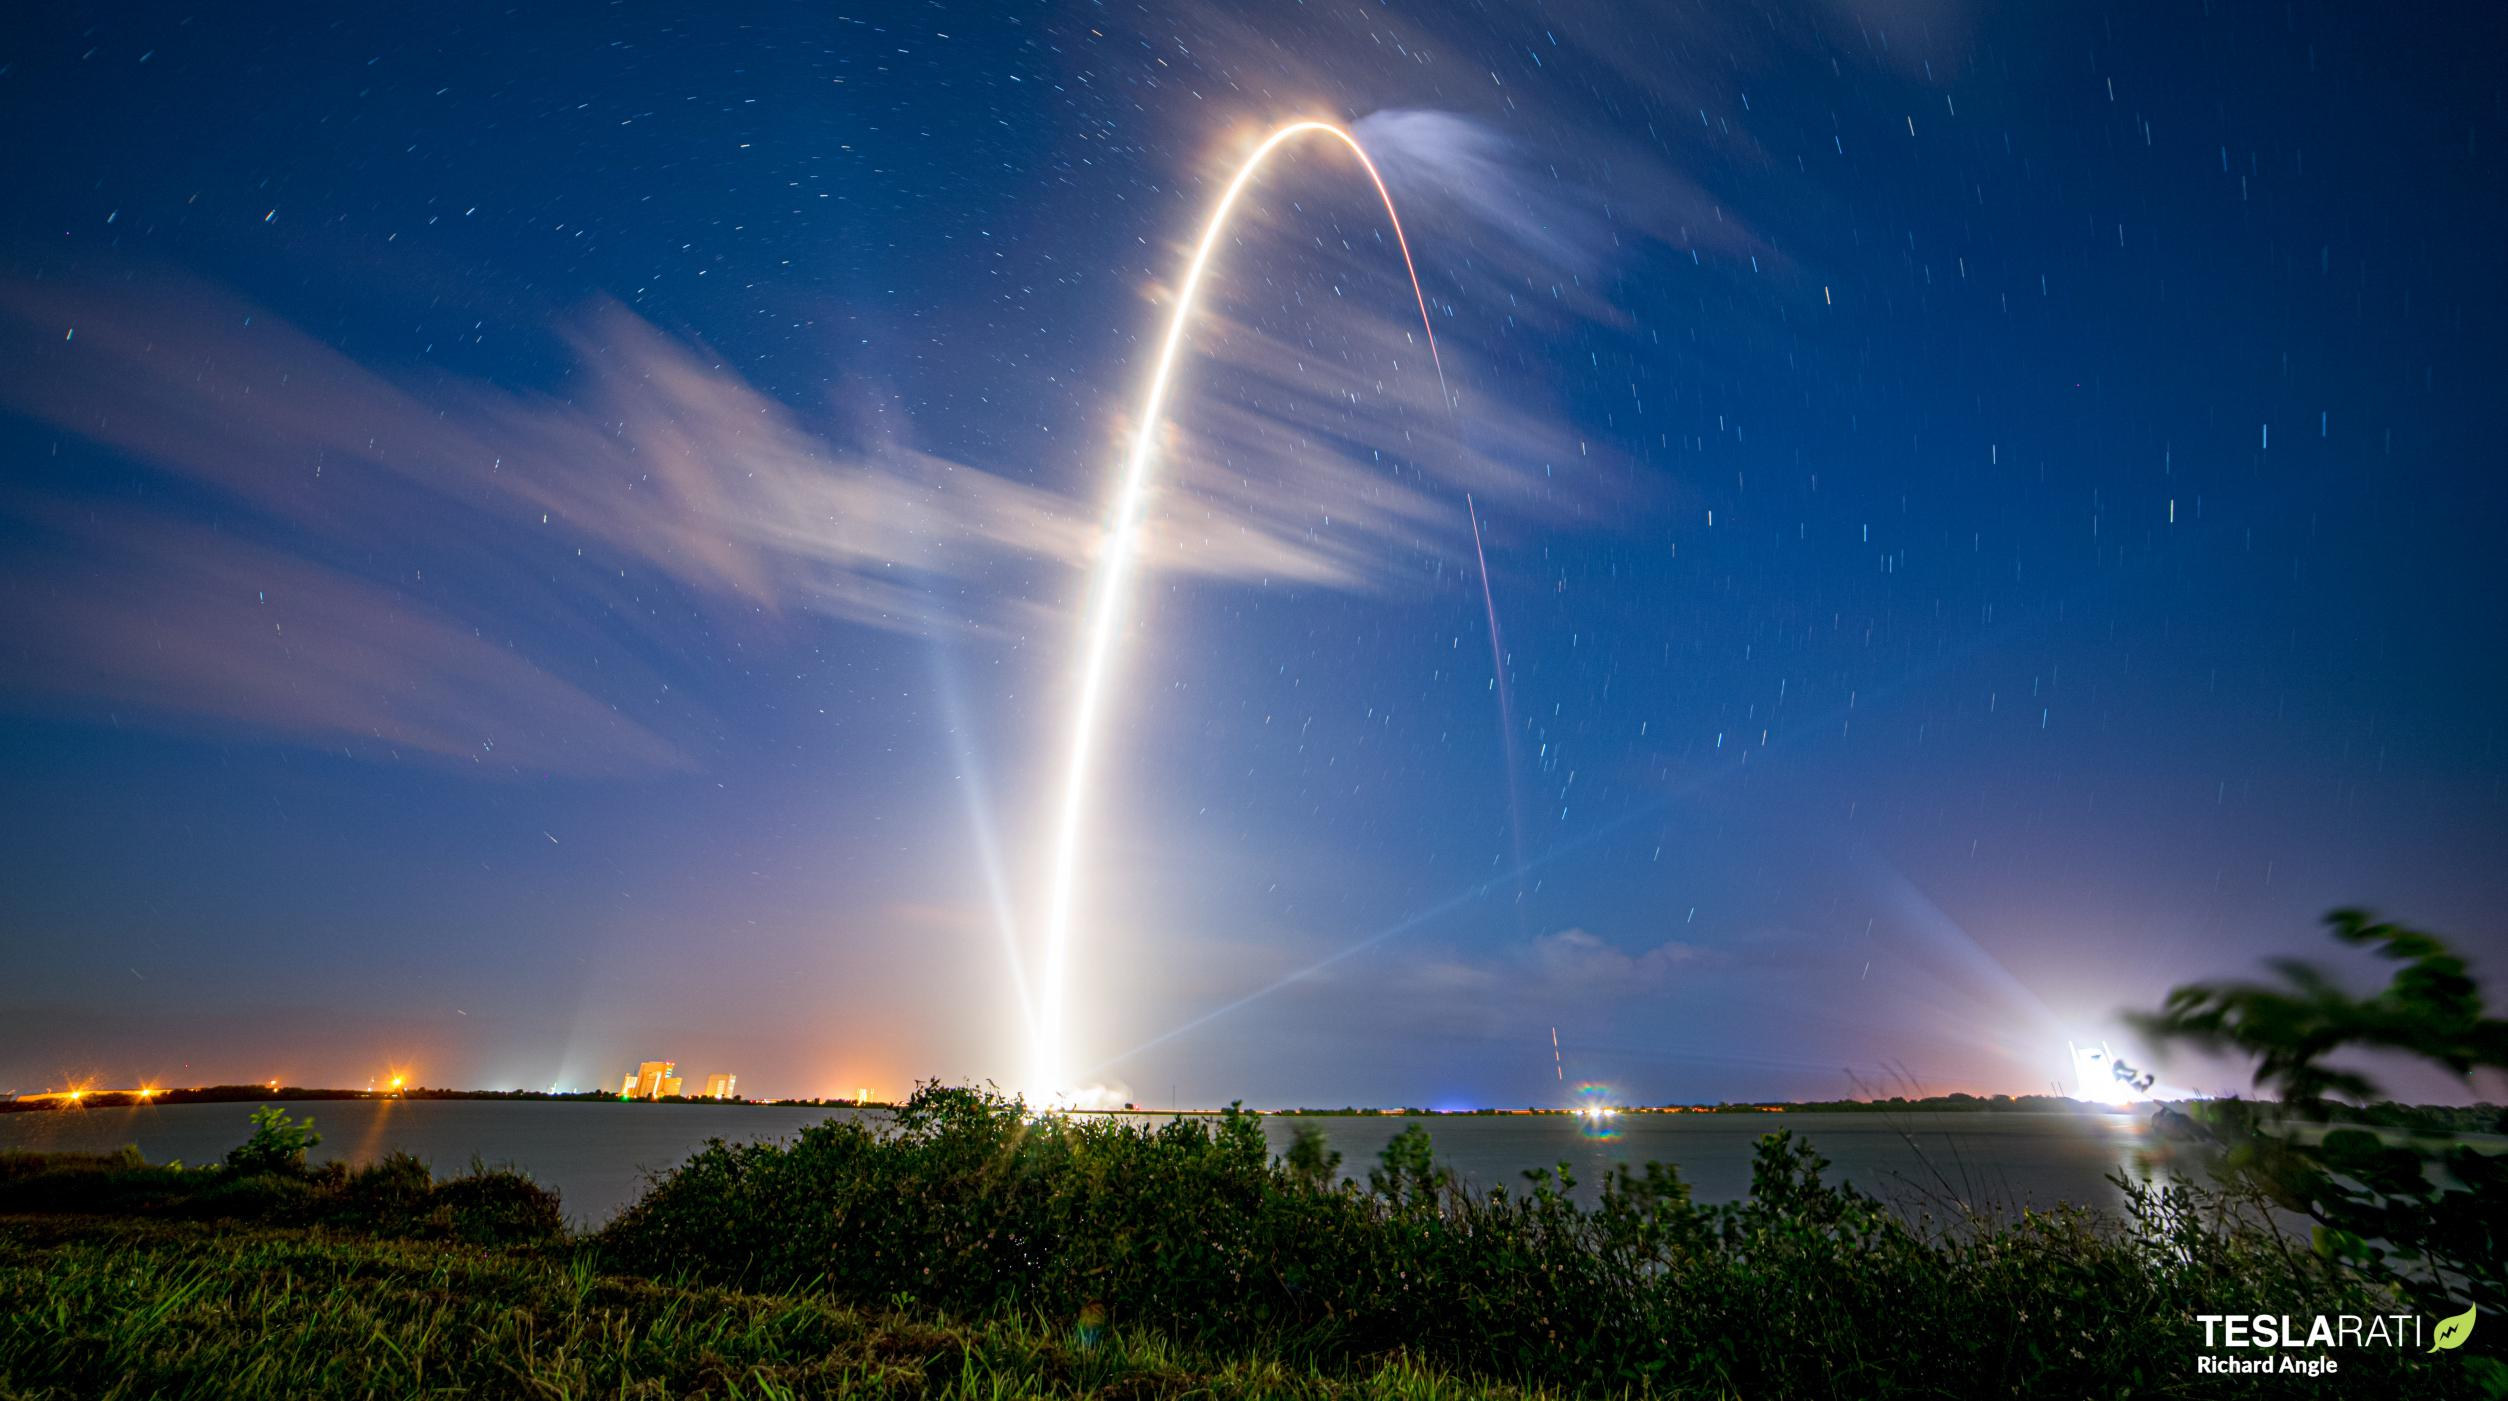 GPS III SV04 Falcon 9 B1062 LC-40 110520 (Richard Angle) streak 1 (c)